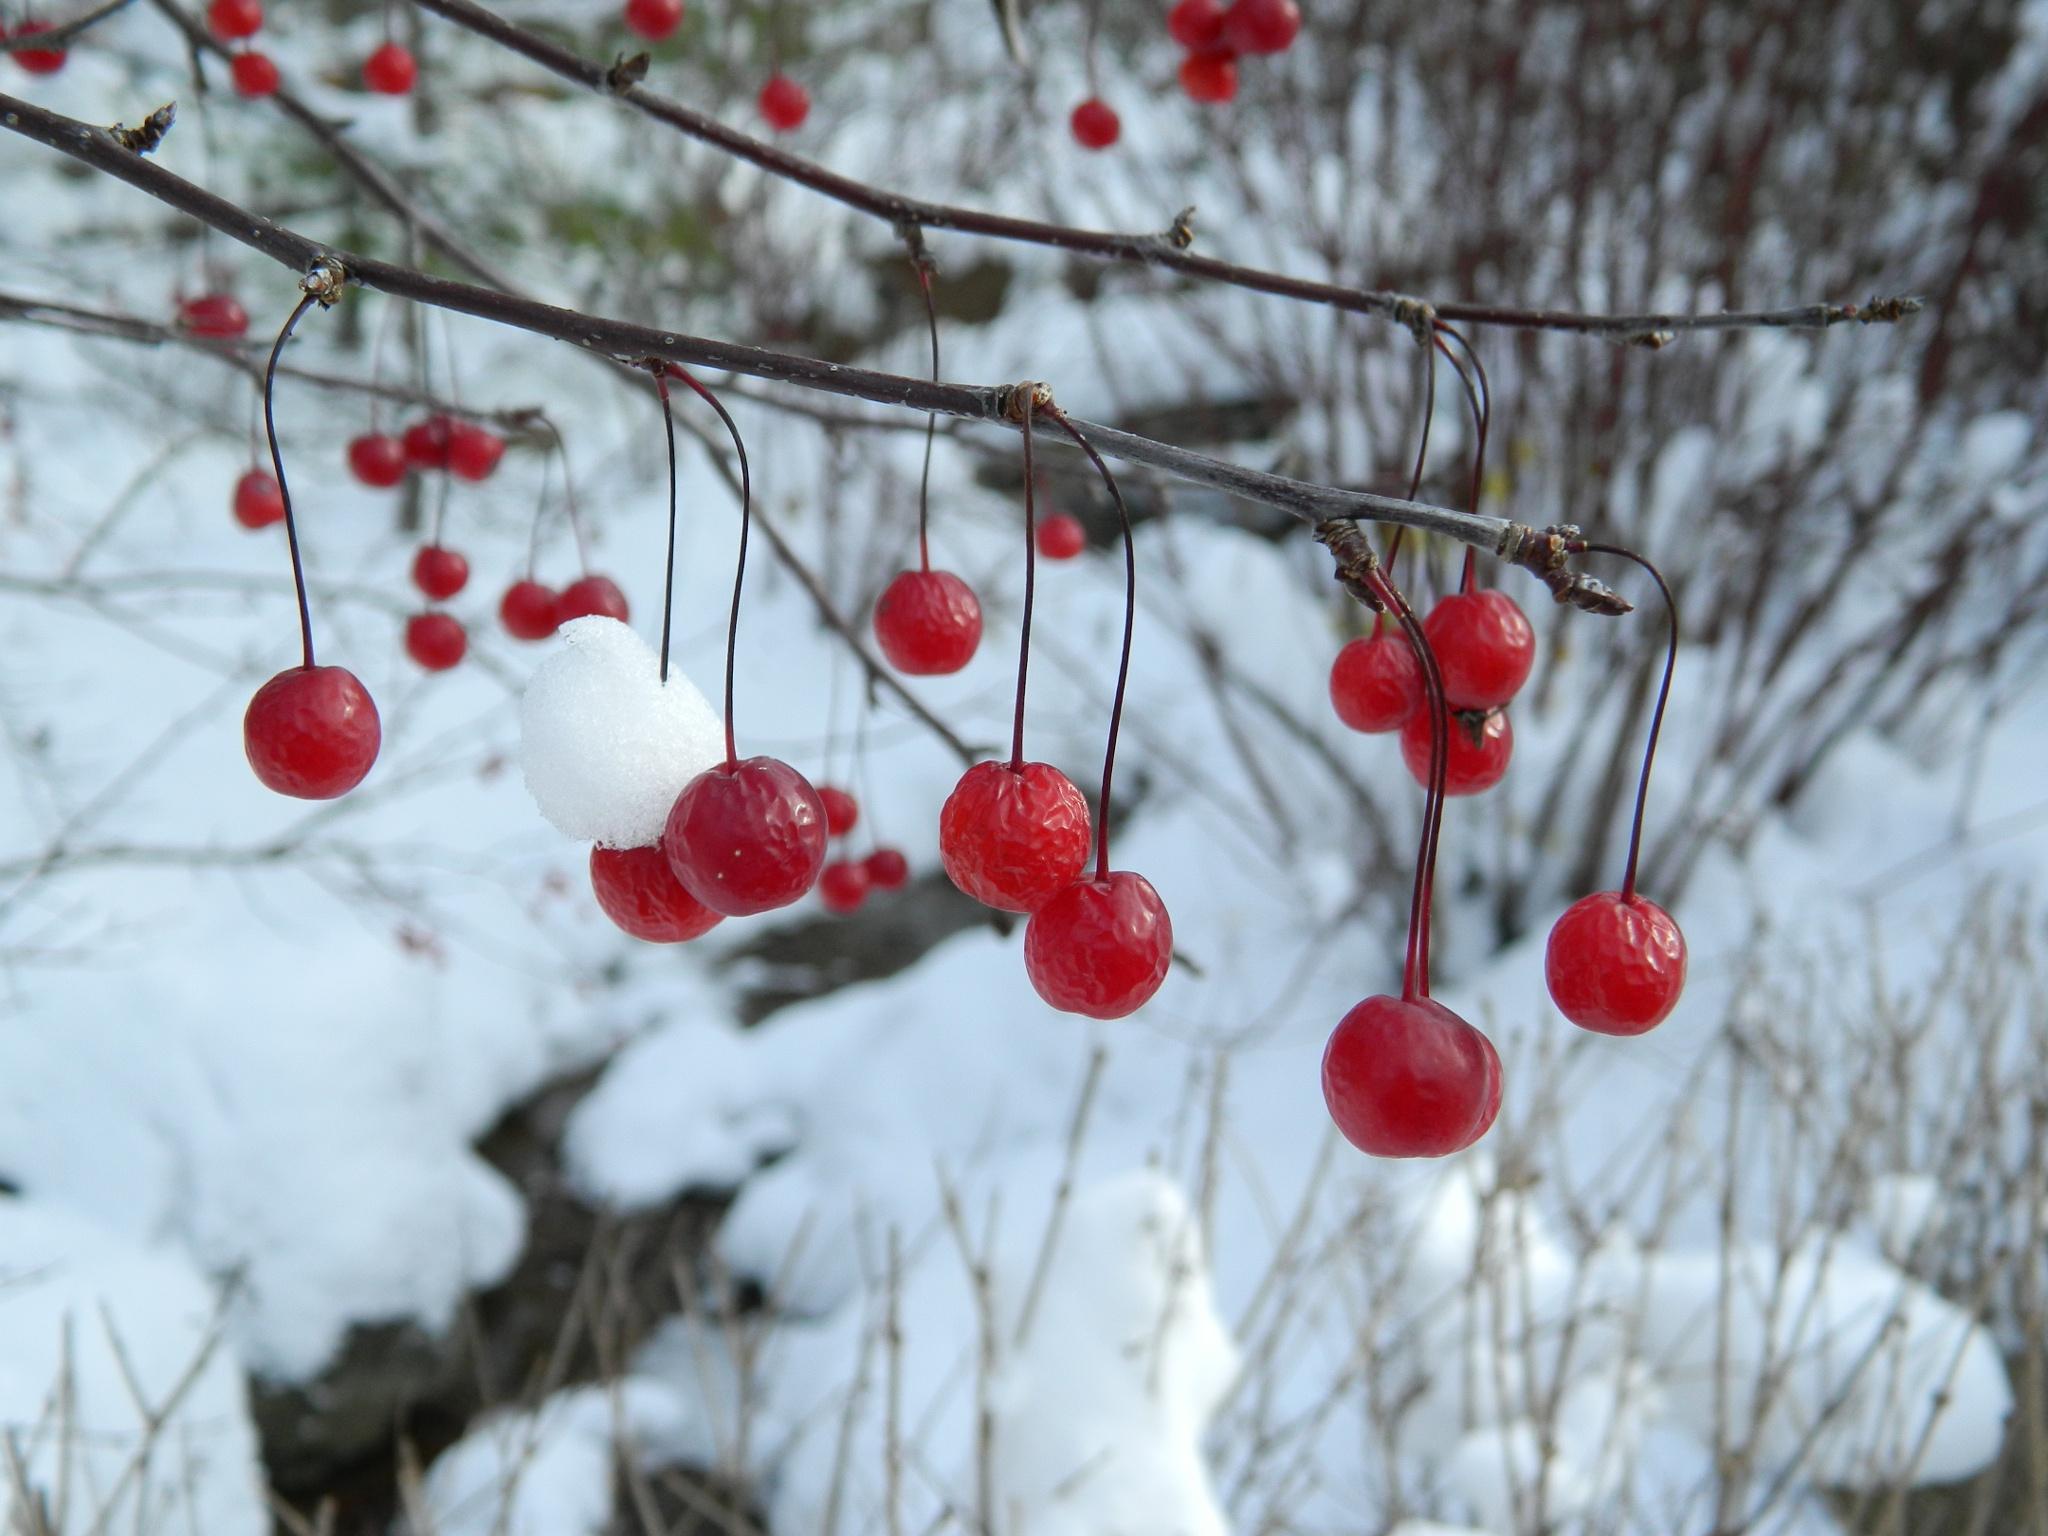 Winter Berries by kristina.chermak